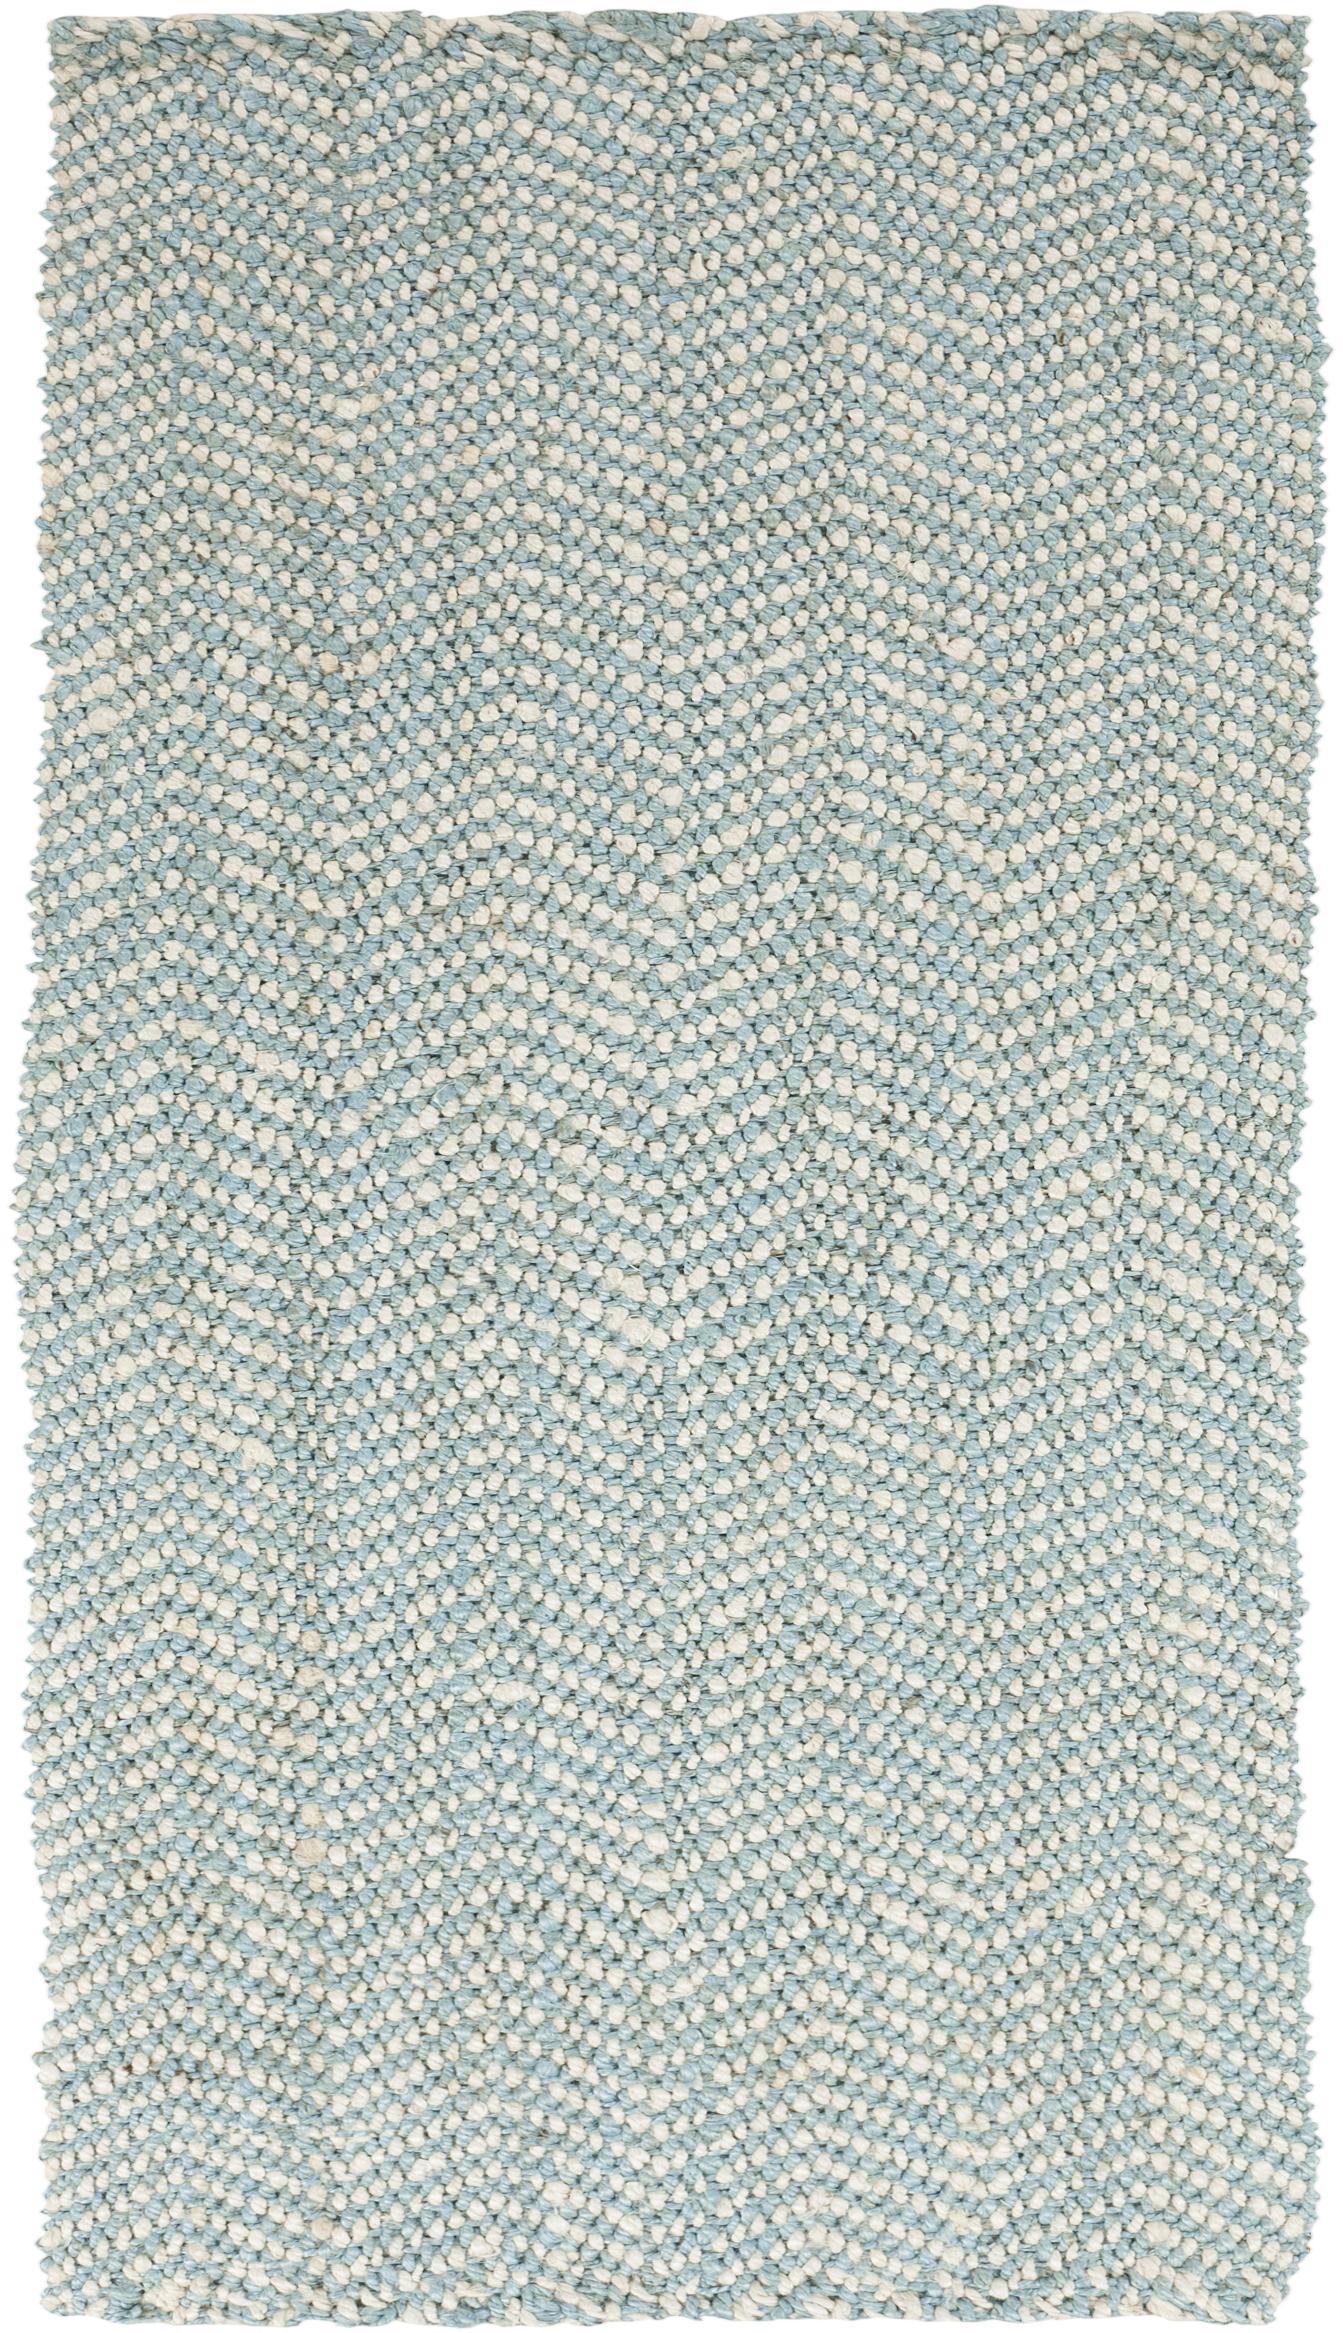 Surya Reeds 2' x 3' - Item Number: REED802-23